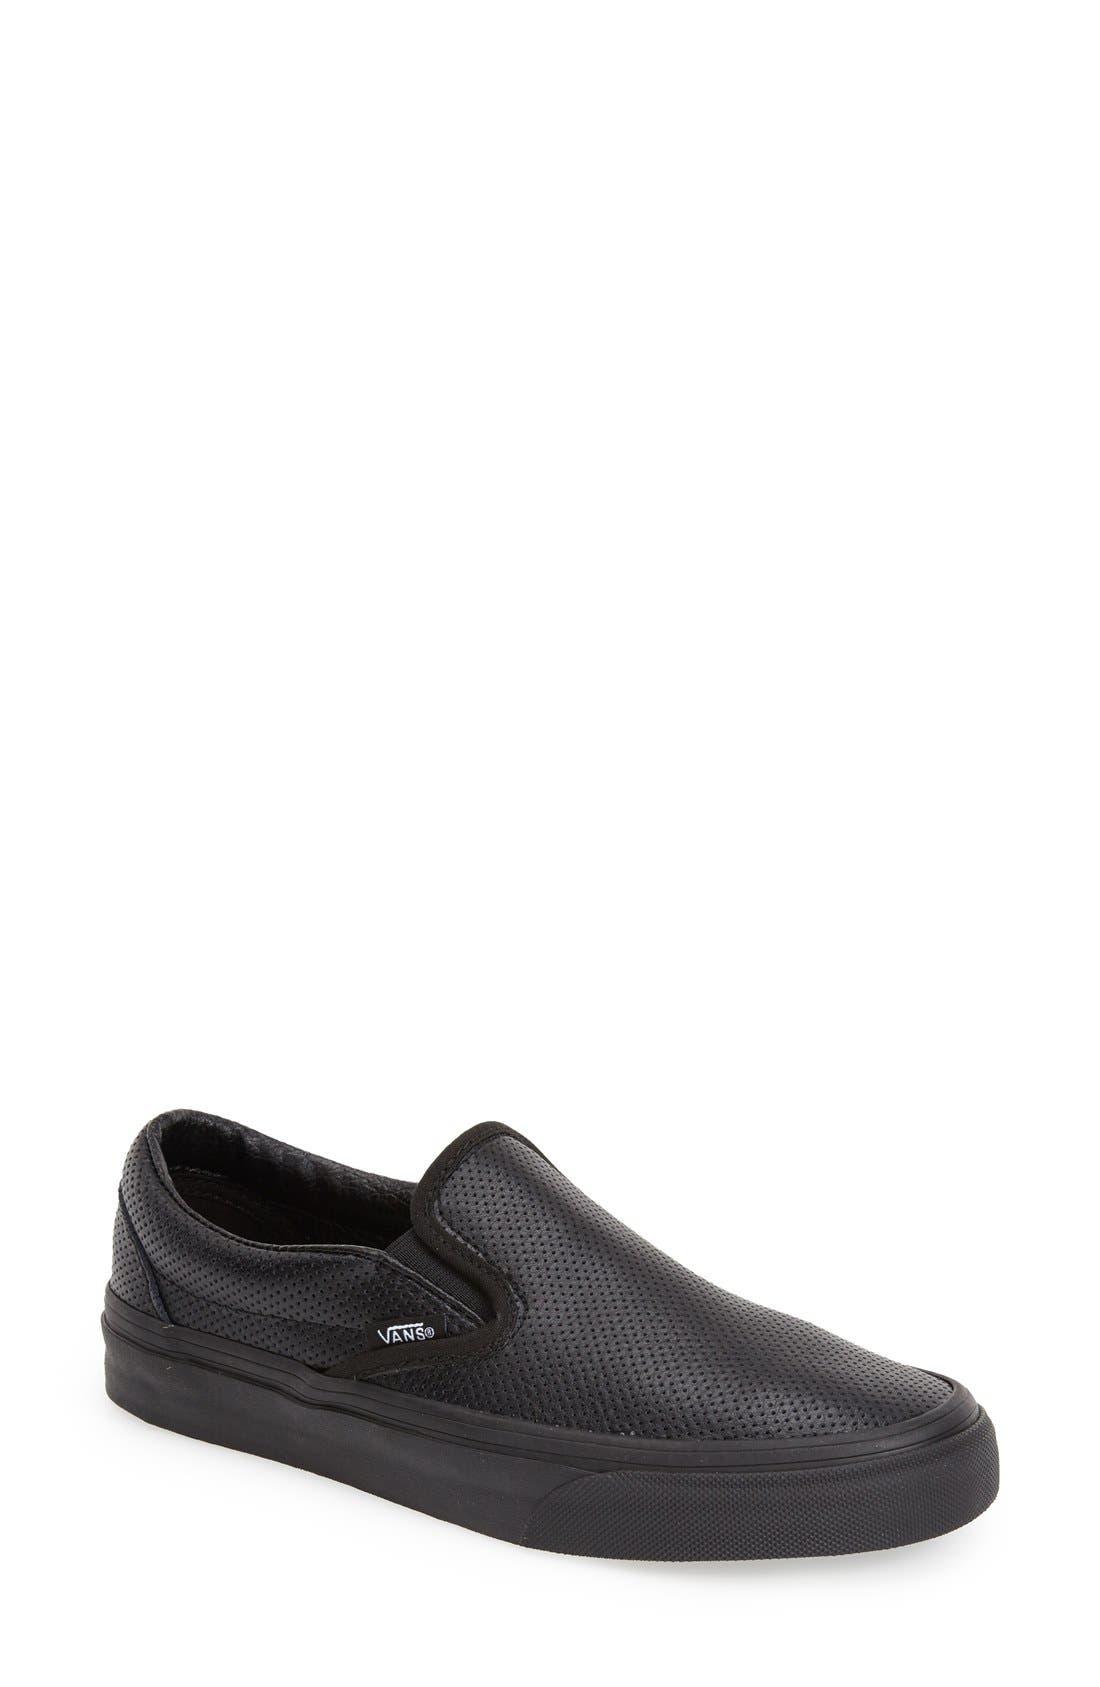 Main Image - Vans 'Classic - Perforated' Slip-On Sneaker (Women)